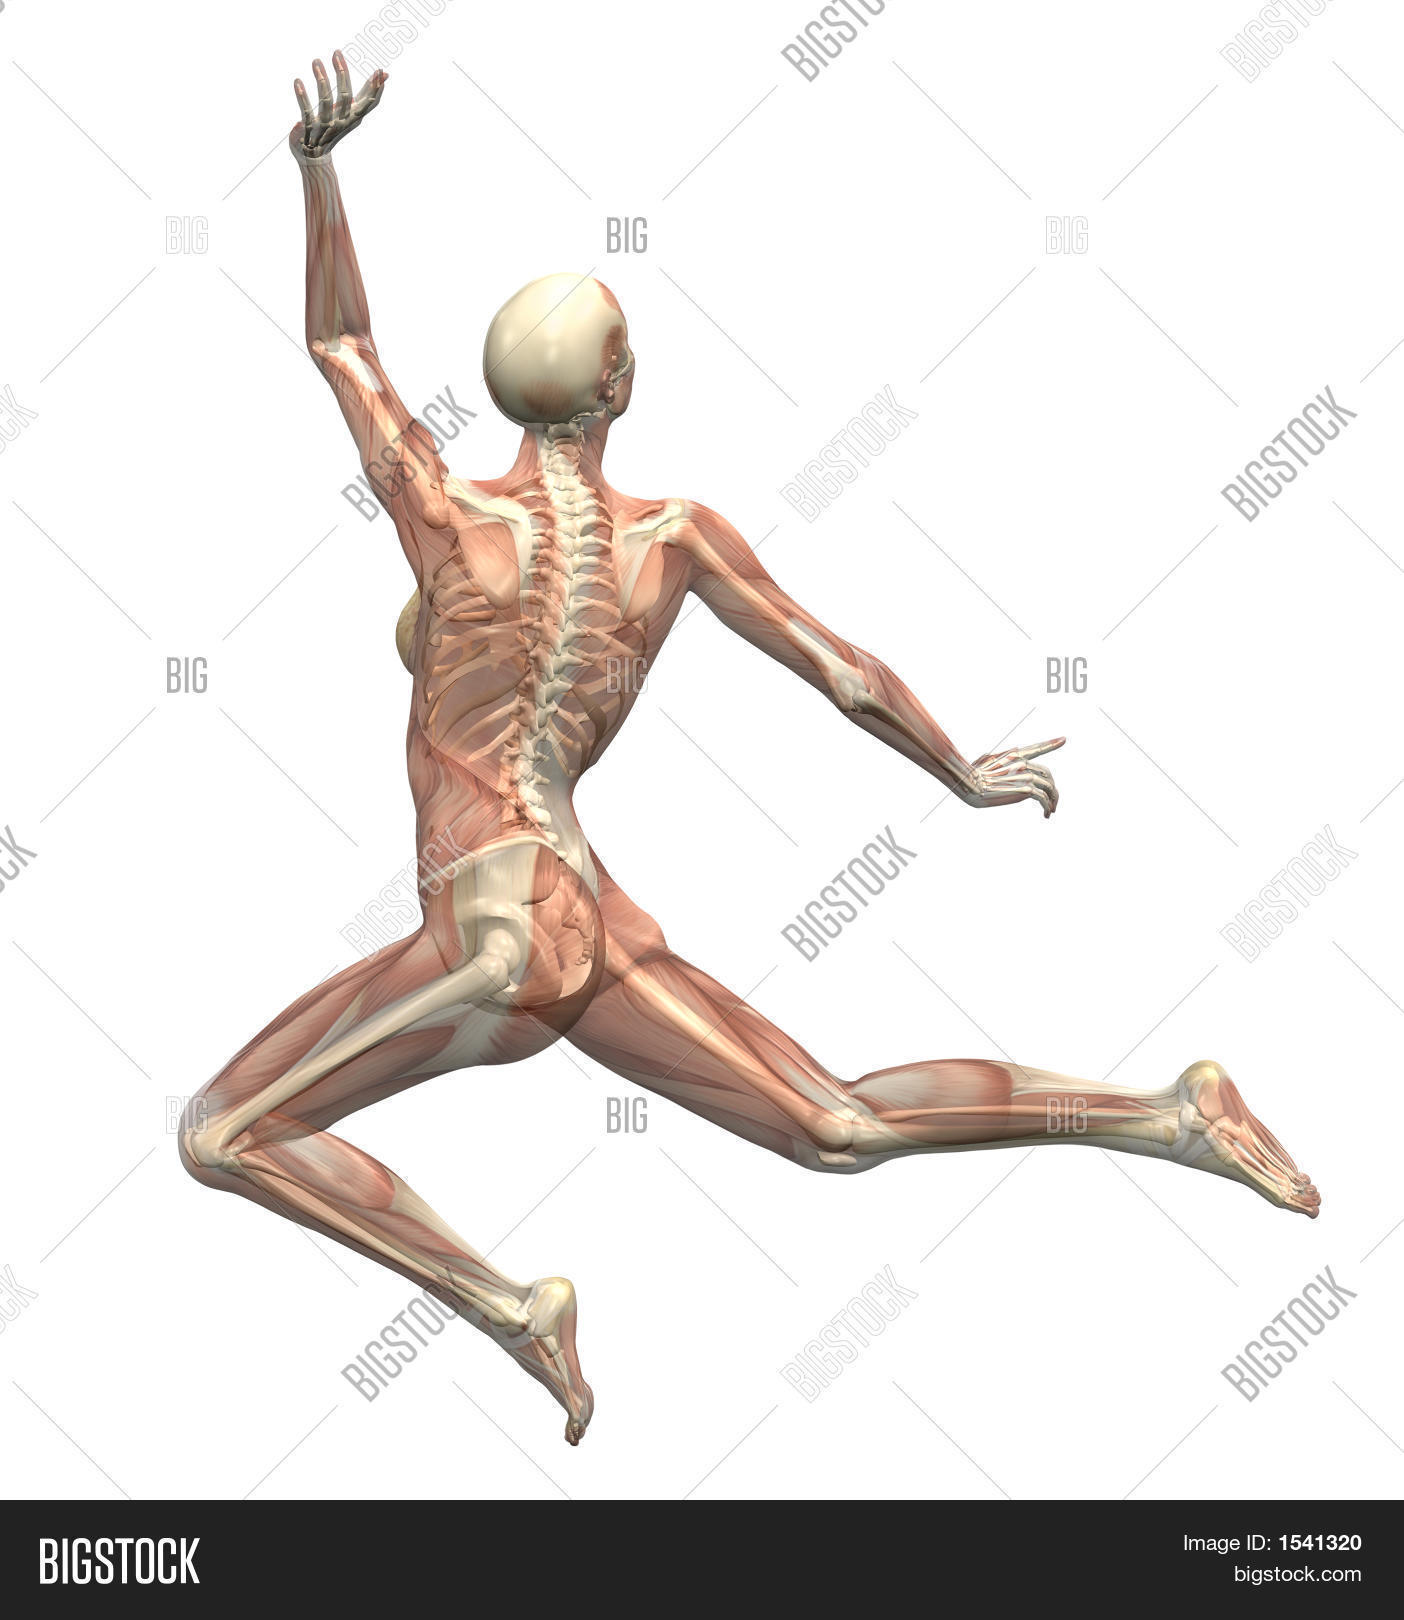 Anatomy Motion - Woman Image & Photo (Free Trial) | Bigstock